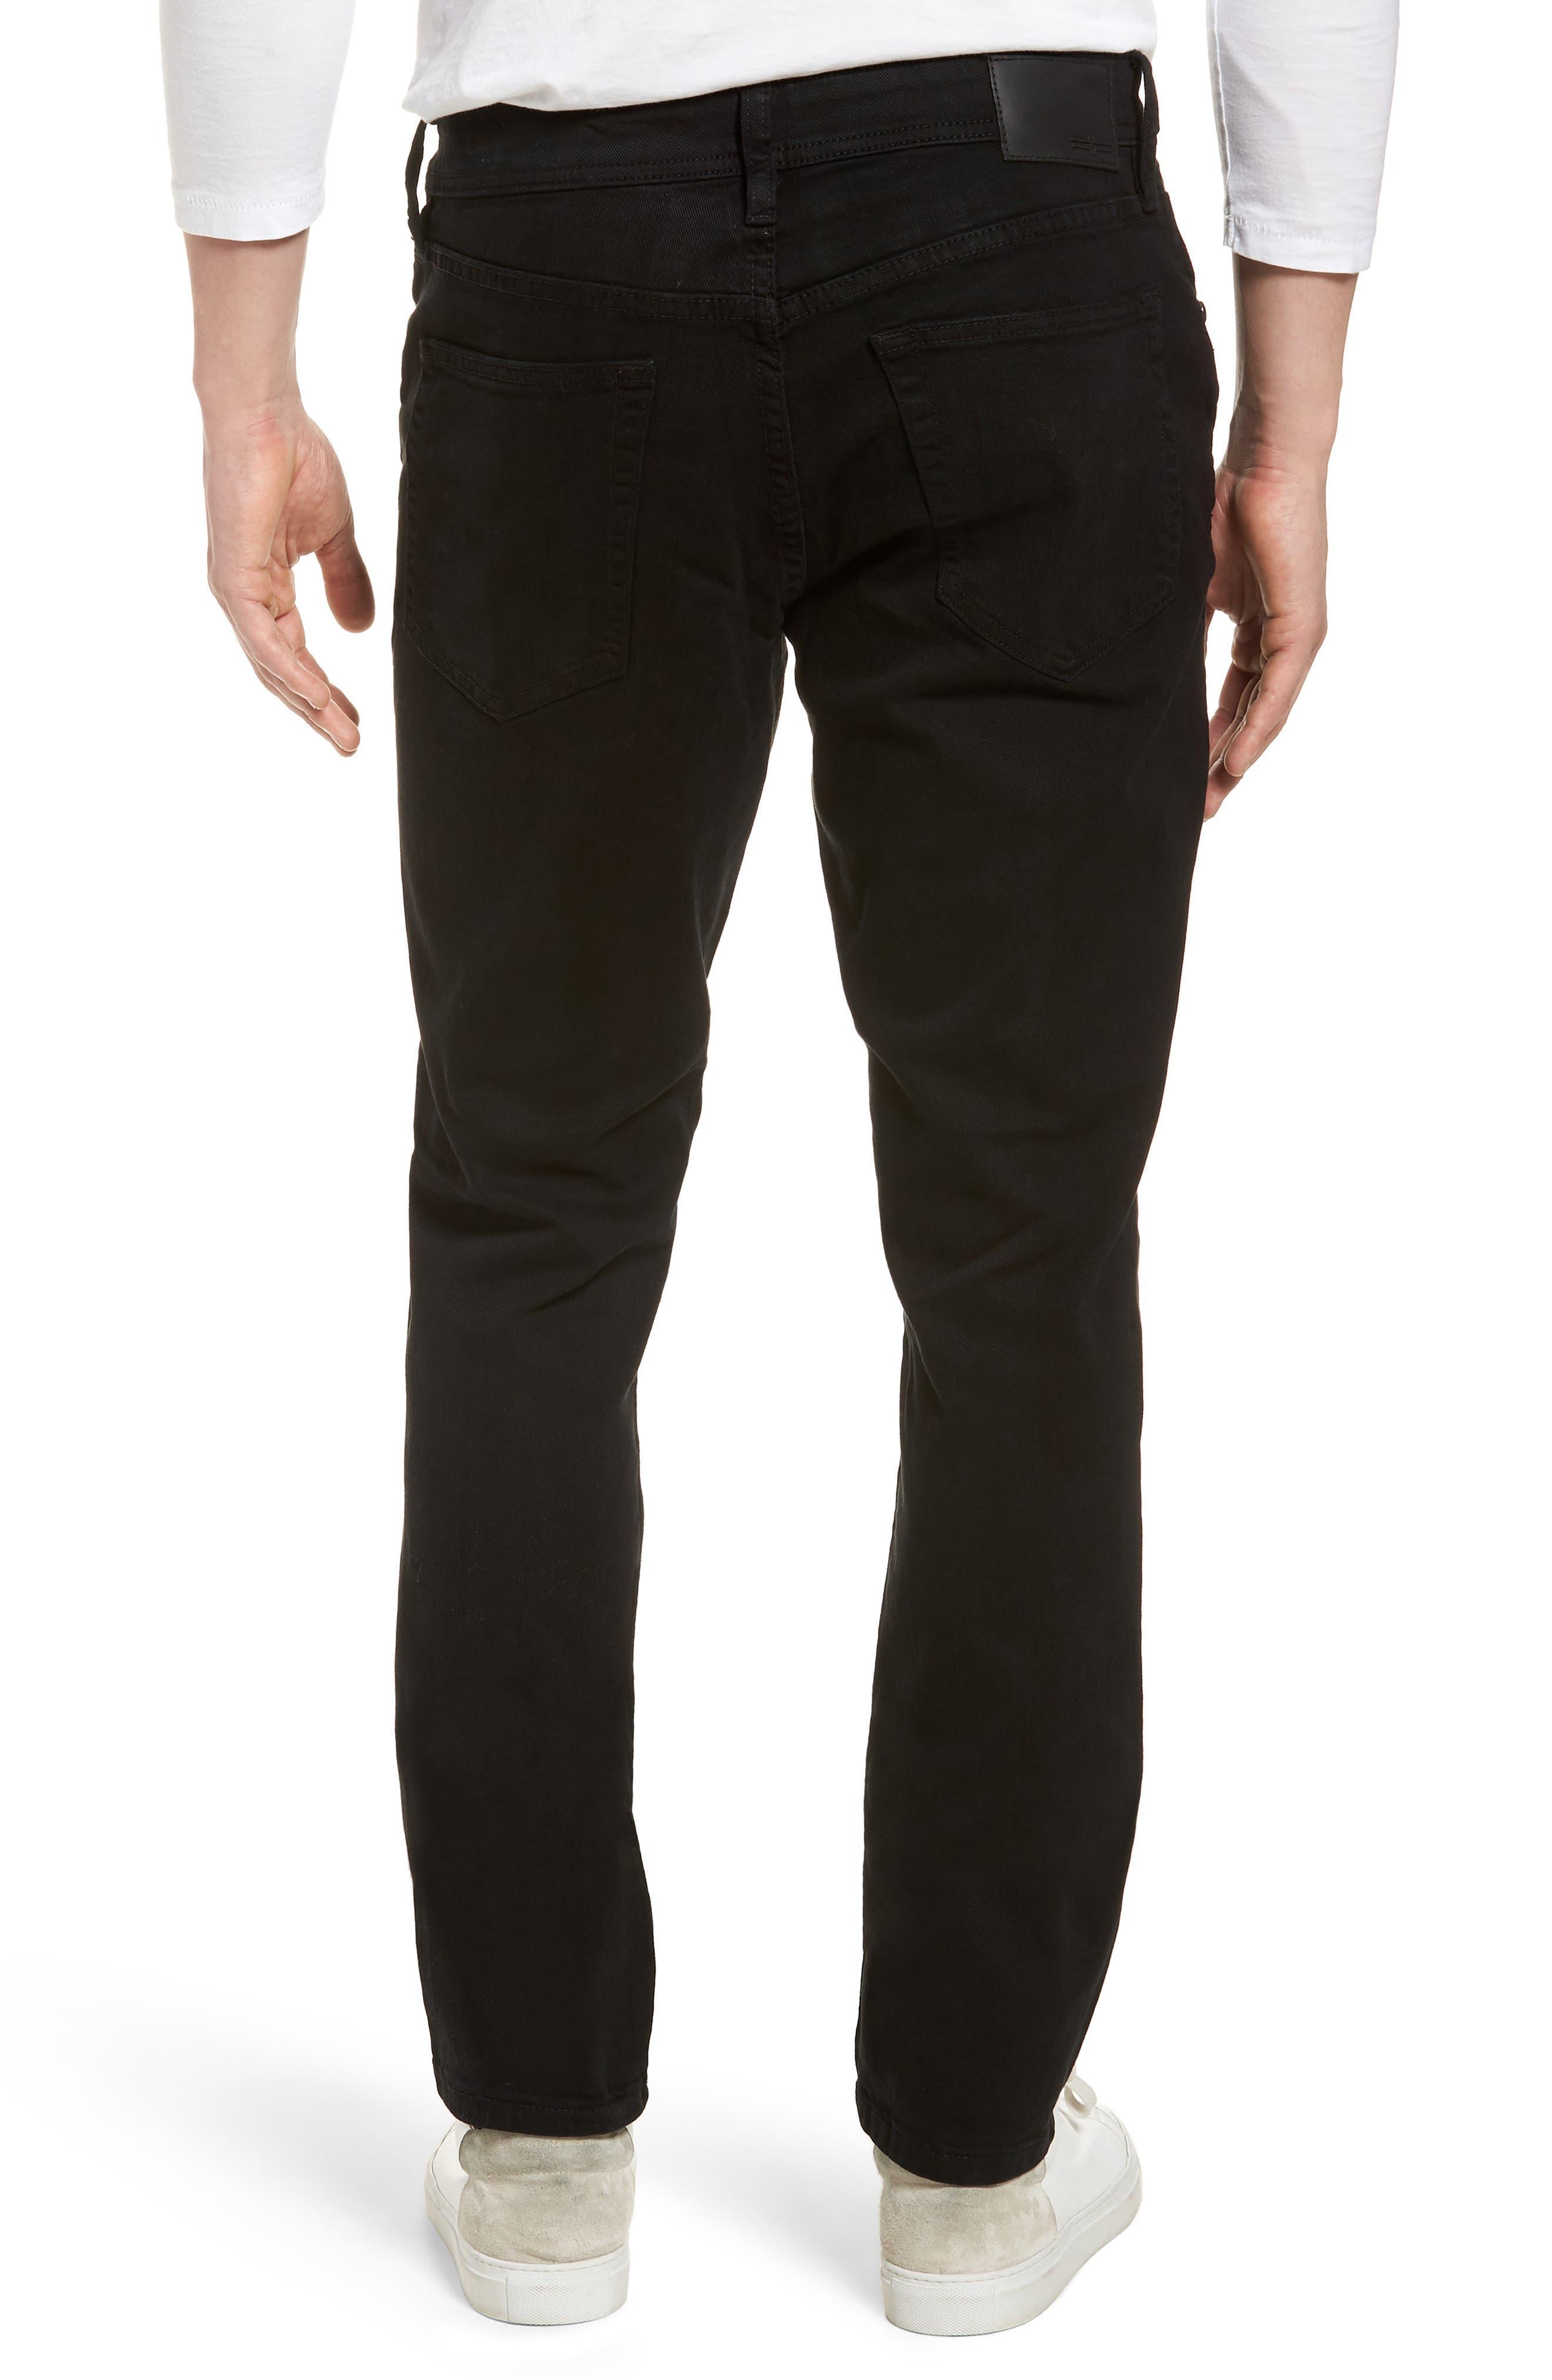 Jeans Co. Kingston Slim Straight Leg Jeans,                             Alternate thumbnail 2, color,                             Black Rinse